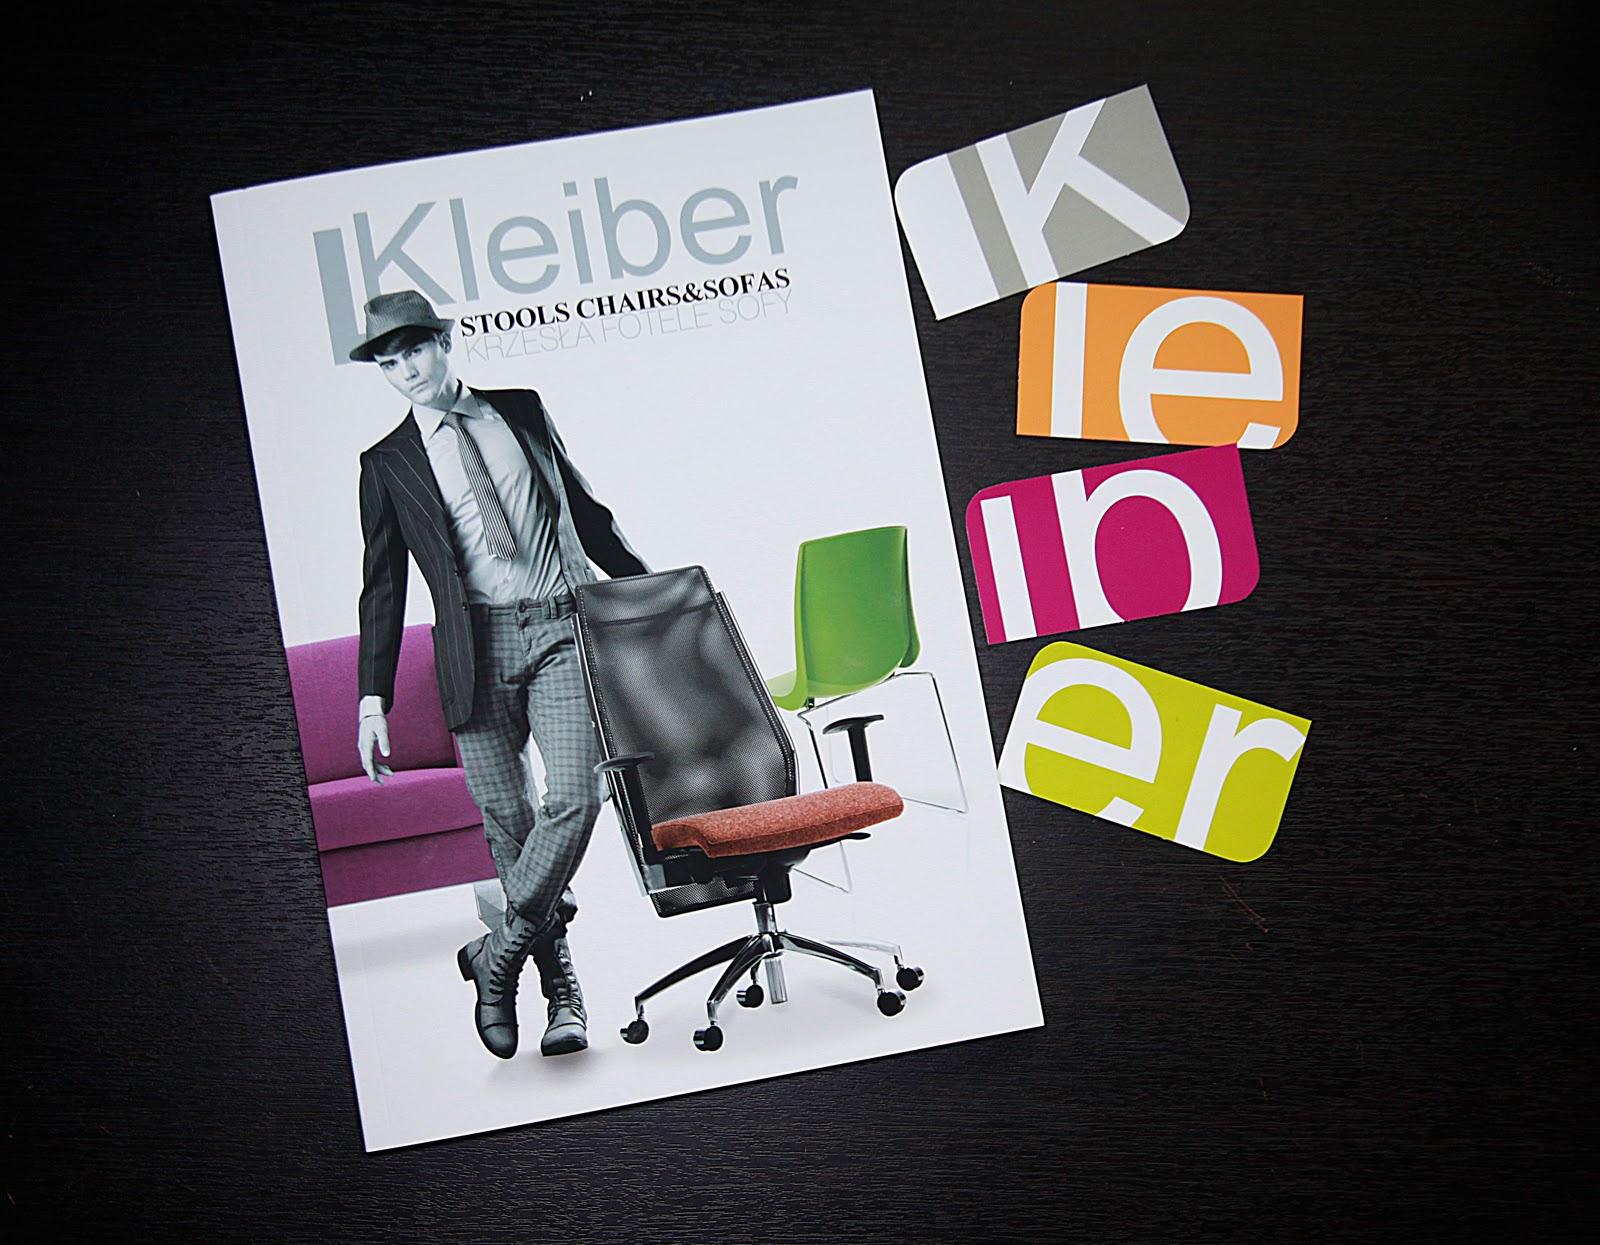 LKleiber katalog 2012 02